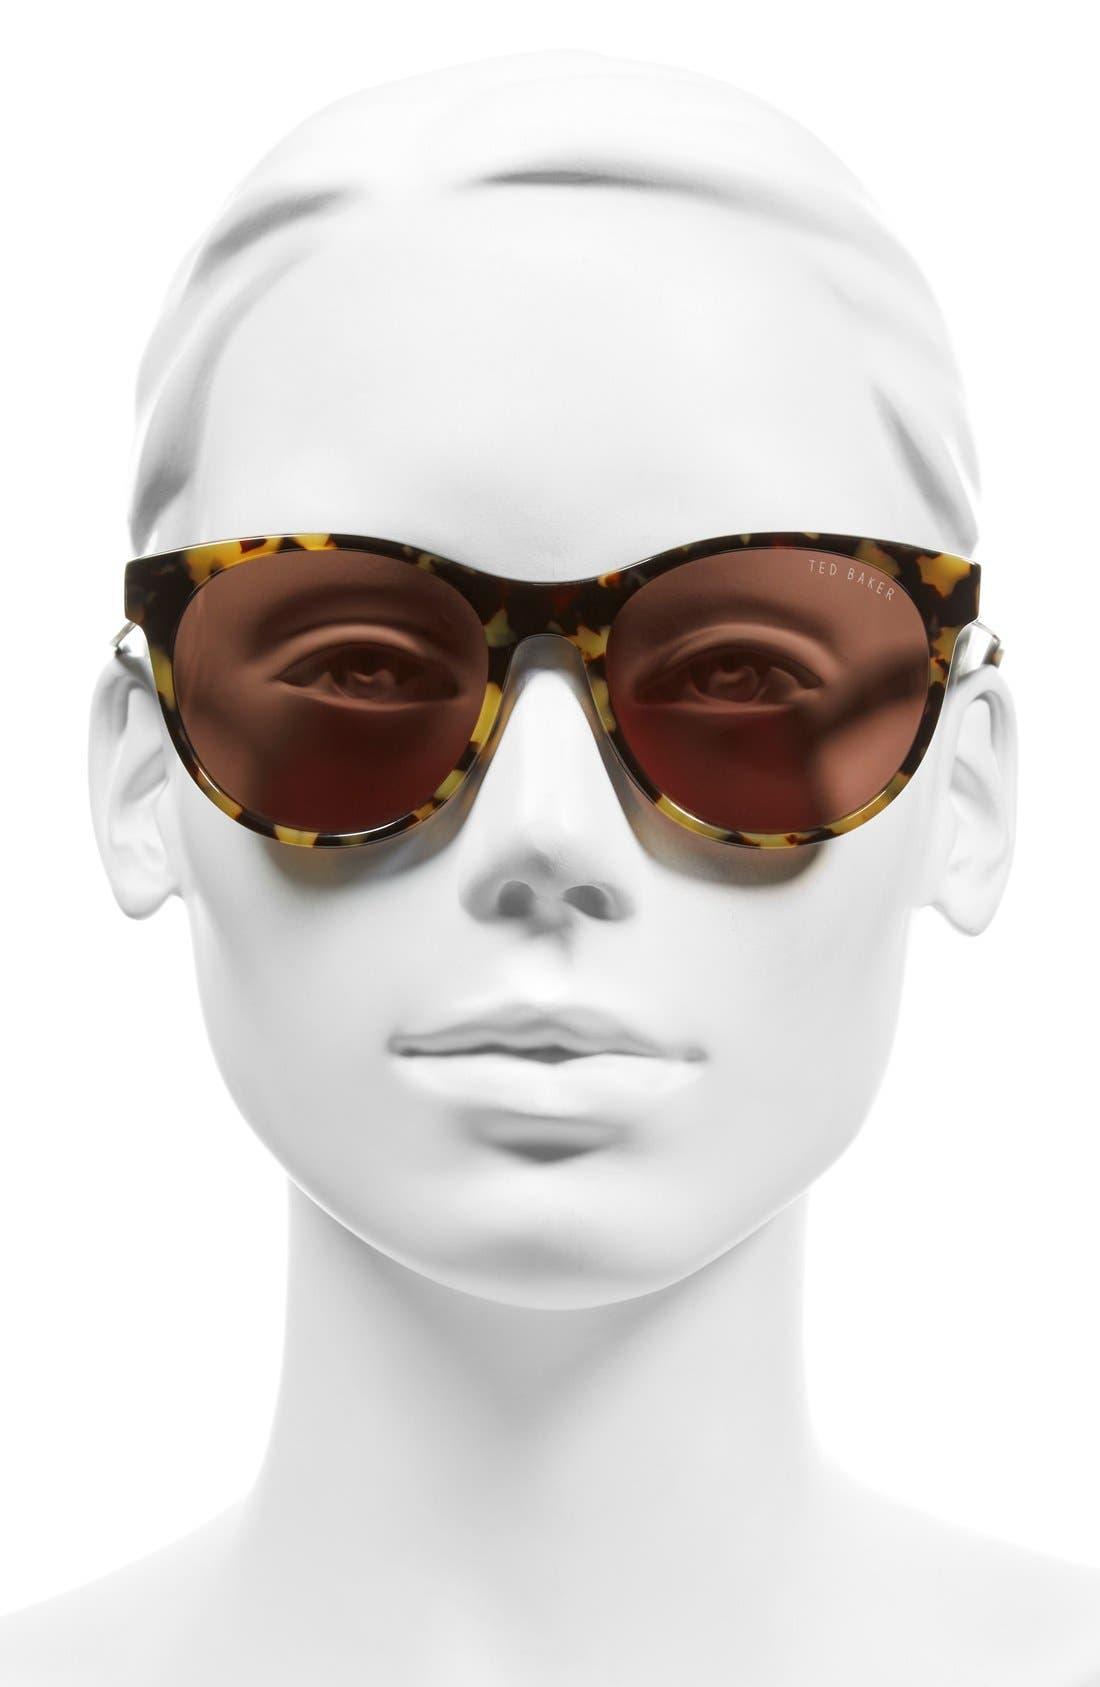 54mm Retro Sunglasses,                             Alternate thumbnail 2, color,                             Tokyo Tortoise